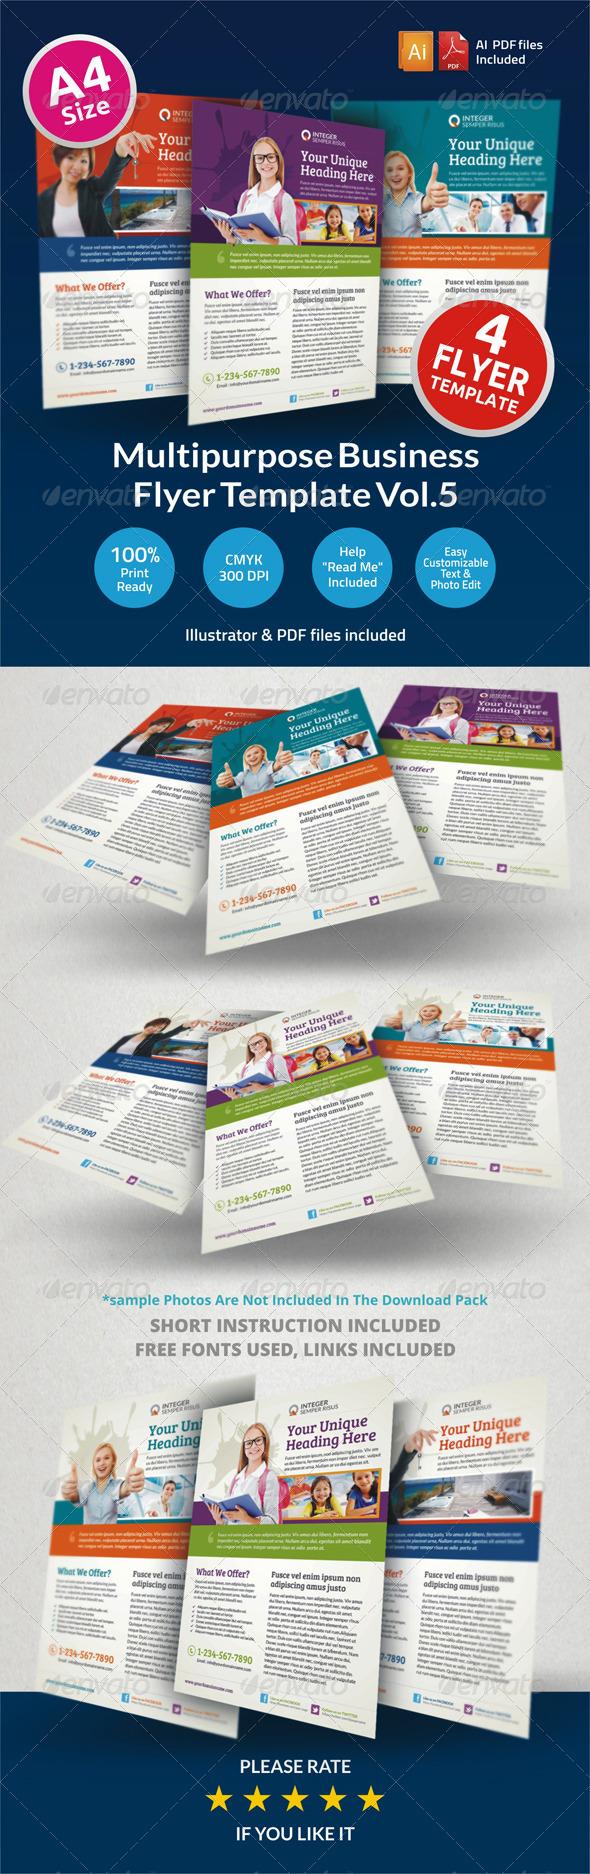 Multipurpose Business Flyer Vol.5 - Corporate Flyers